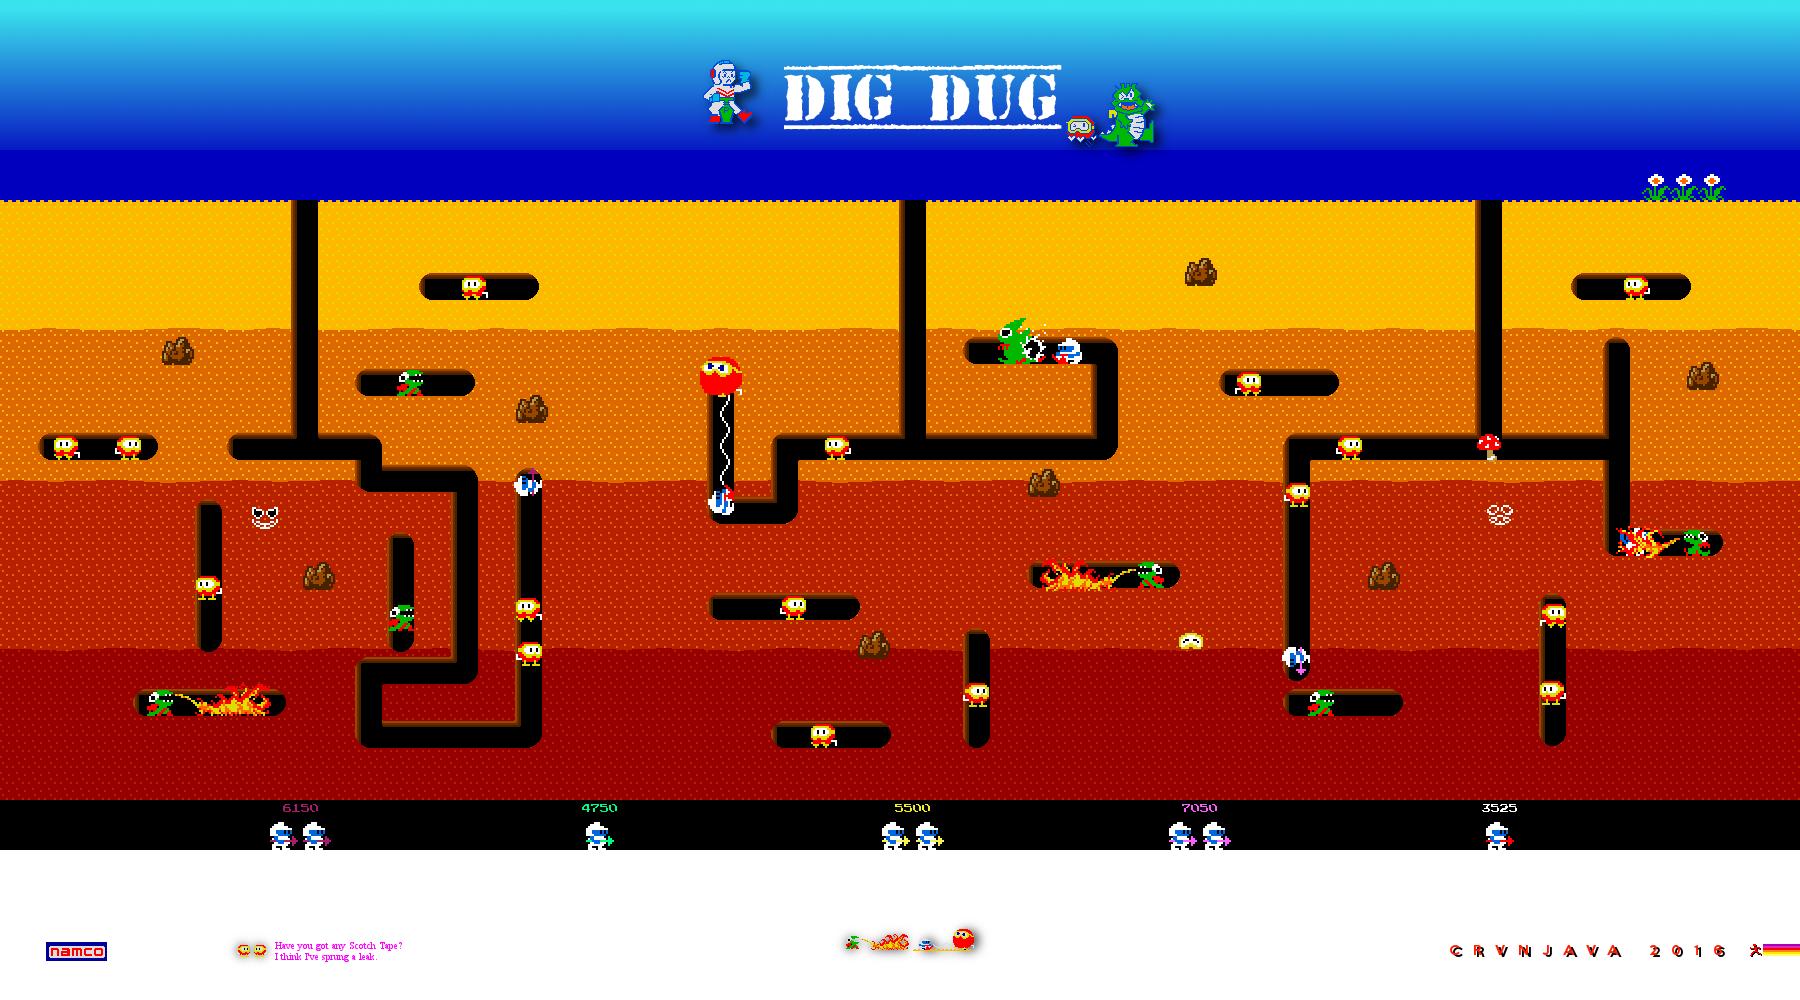 Dig Dug Arcade Game Wallpaper Gaming Pinterest Arcade Games